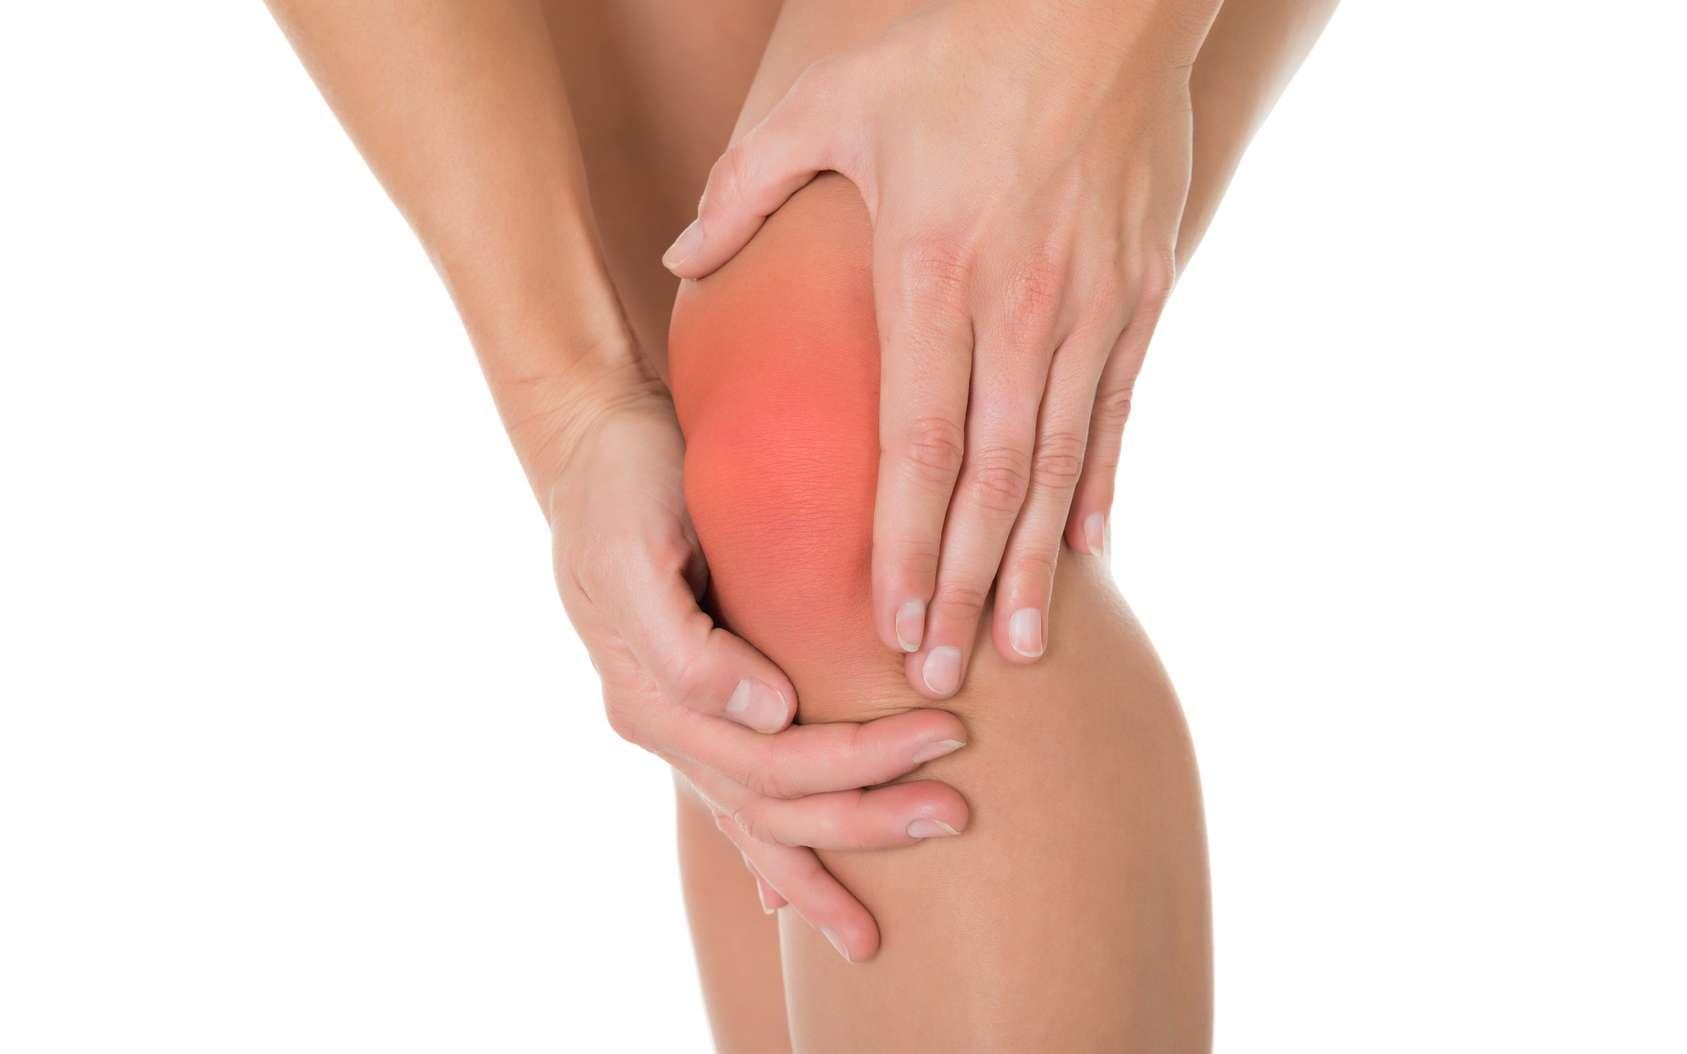 L'arthrose du genou est handicapante. © Andrey Popov, Fotolia